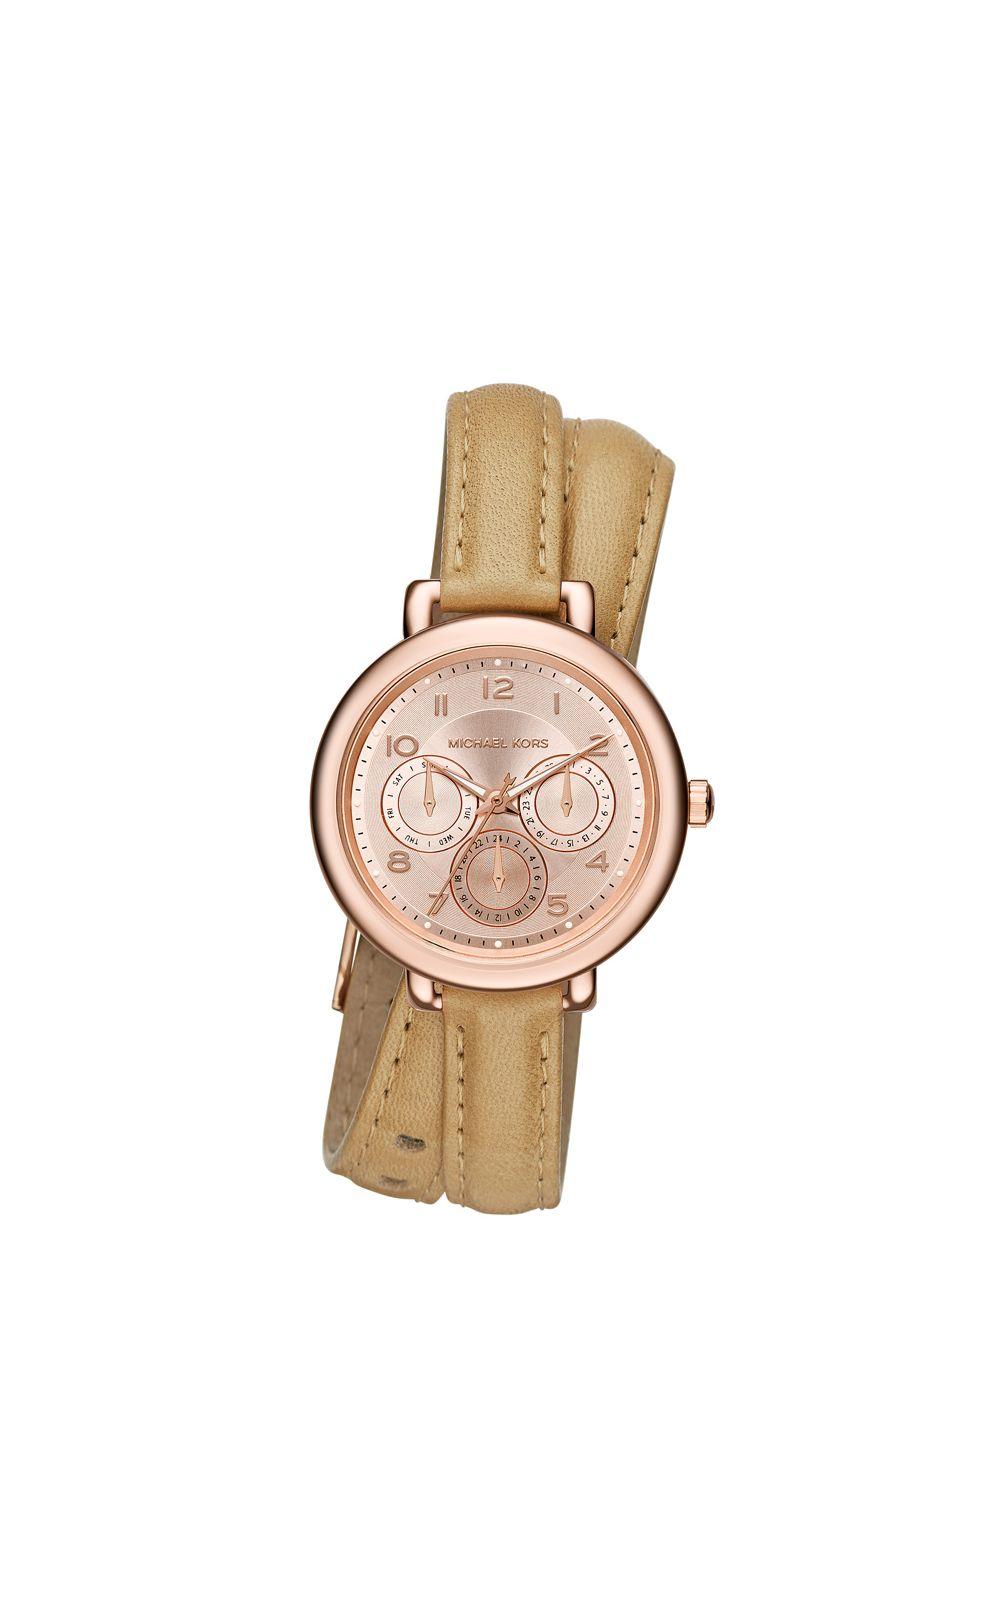 9e59caca7 Relógio Michael Kors Feminino - MK2406/4TN | Opte+